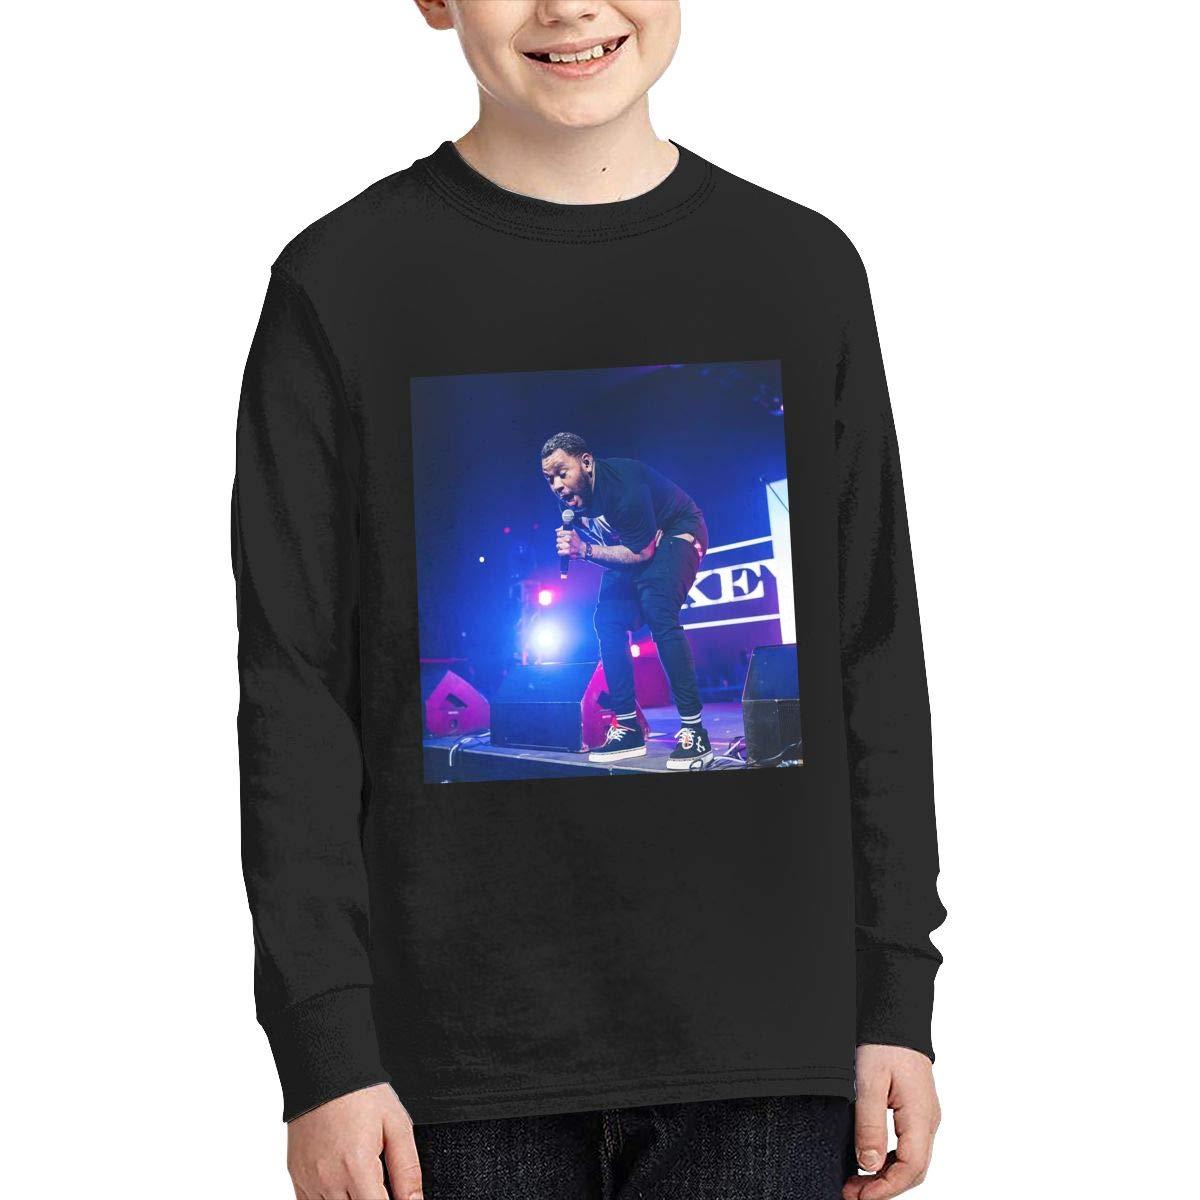 RhteGui Kevin Gates Boys /& Girls Junior Vintage Long Sleeve T-Shirt Black